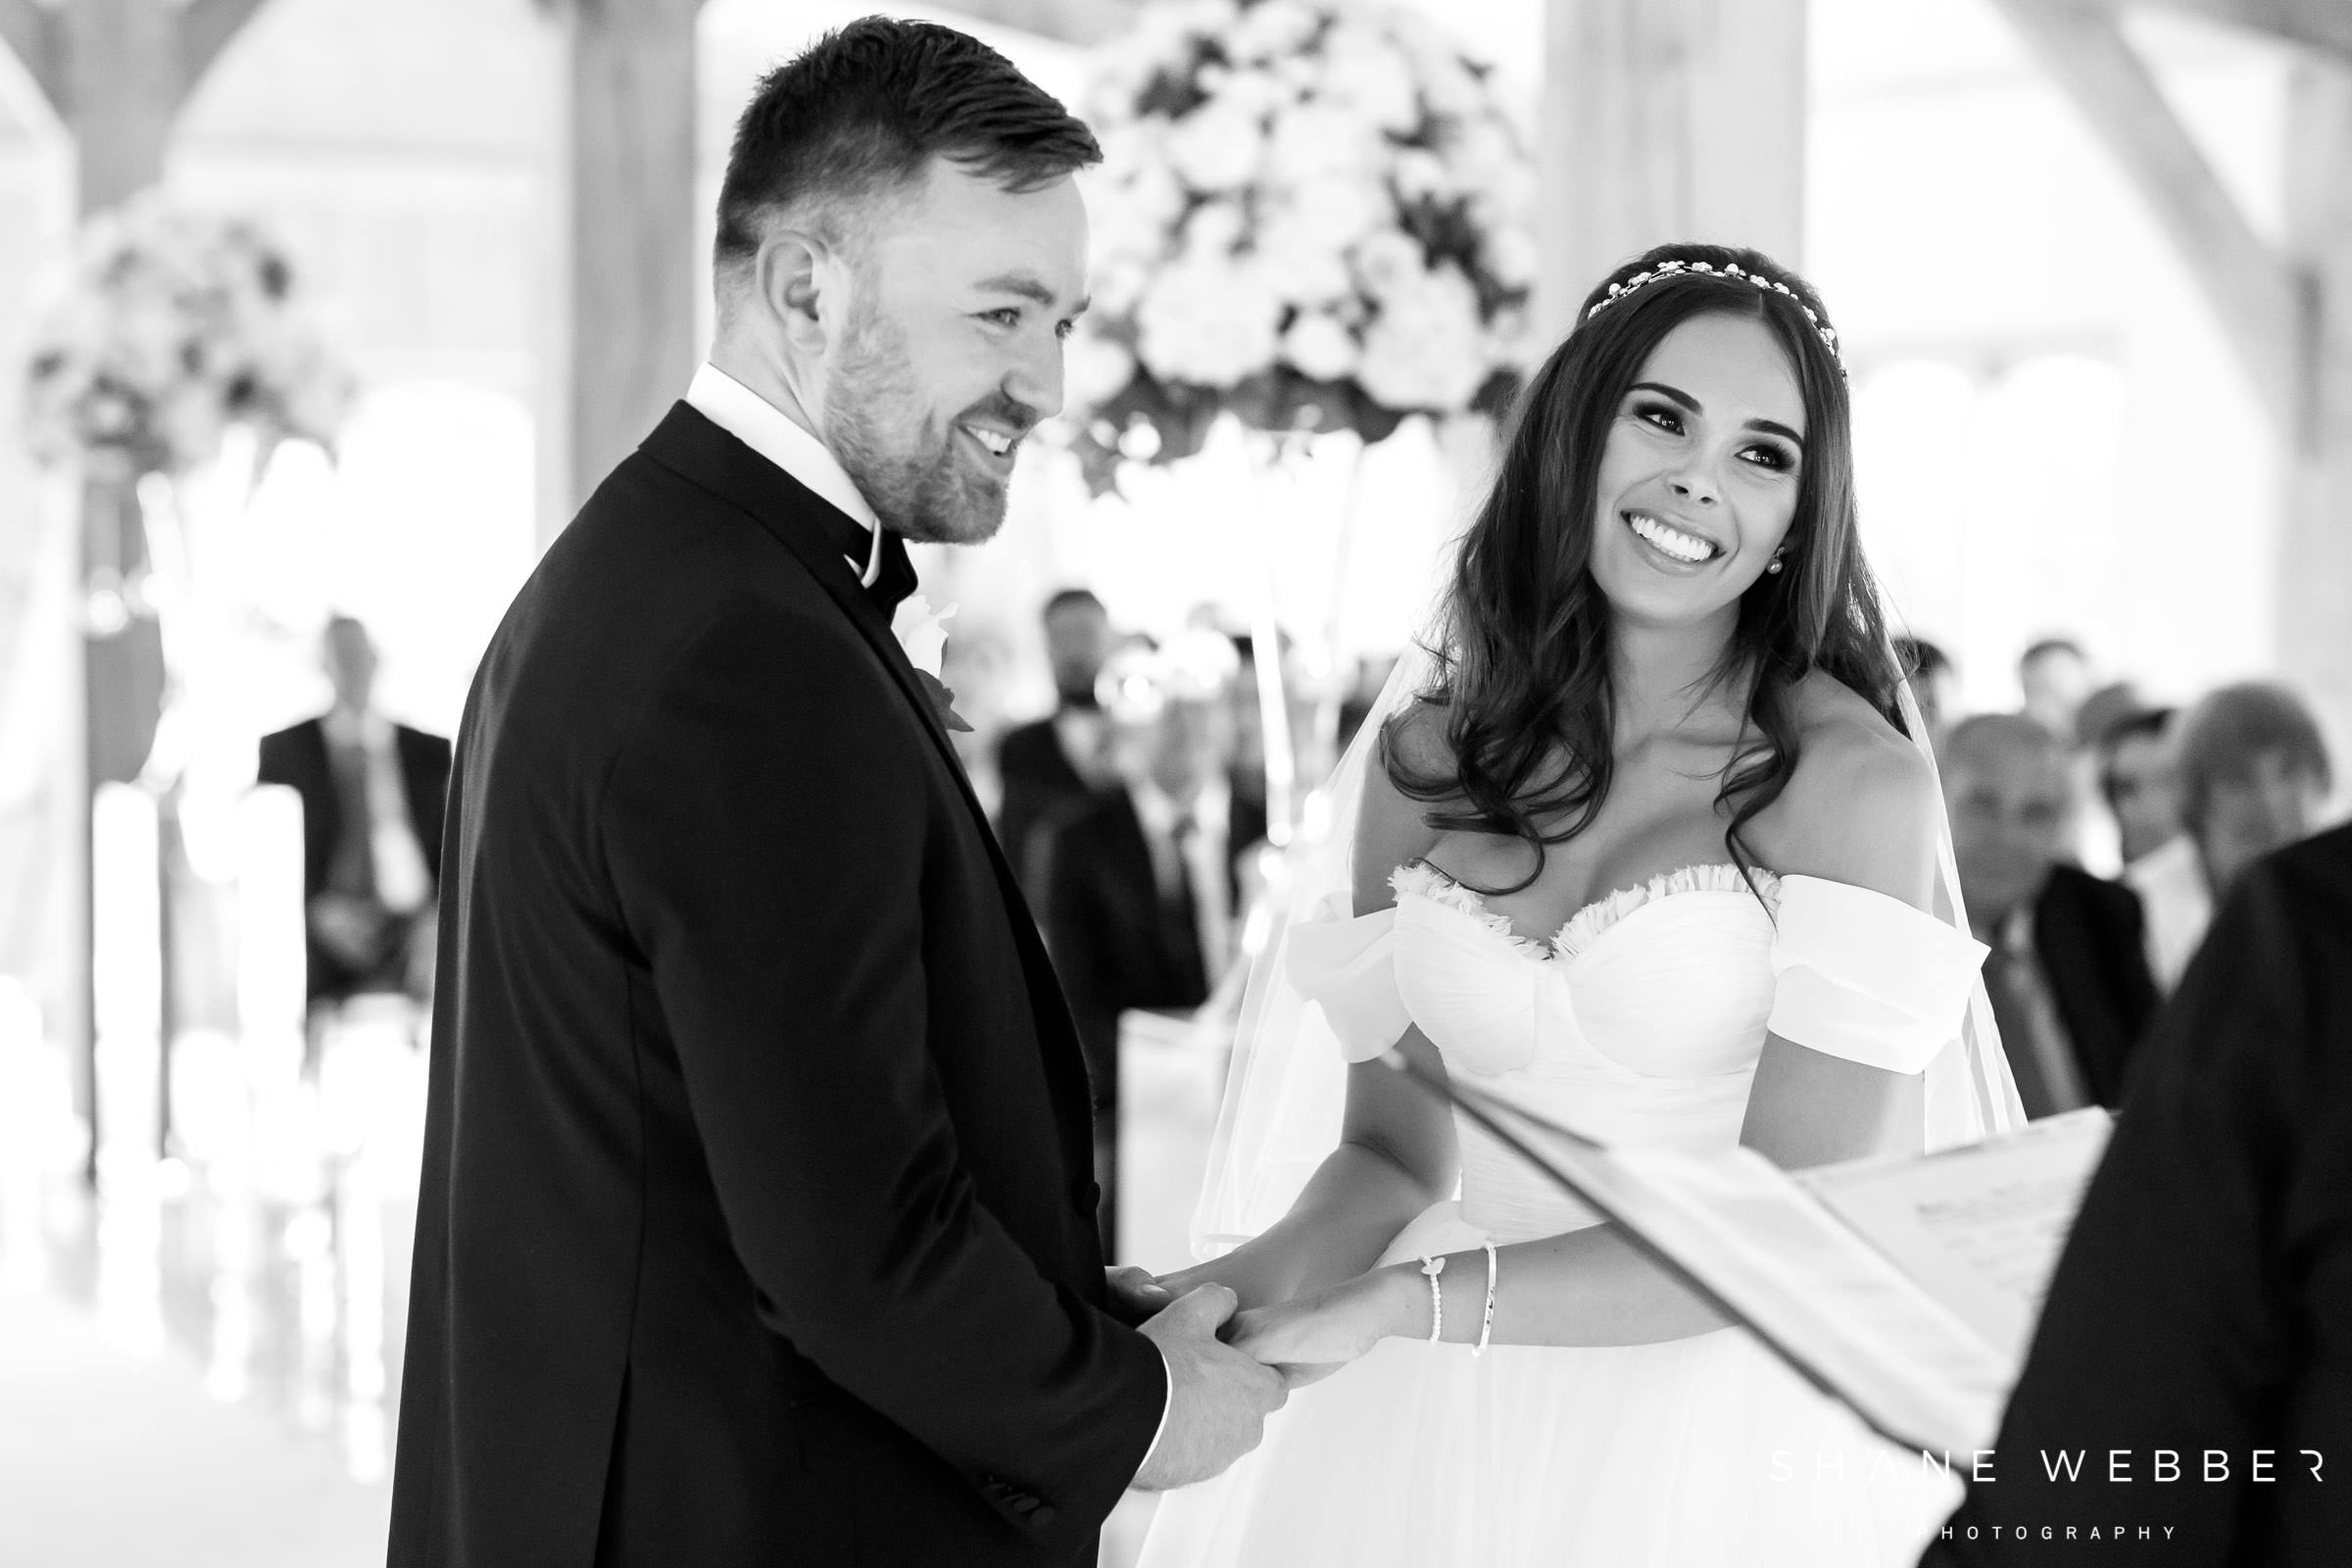 award winning wedding photography Cheshire